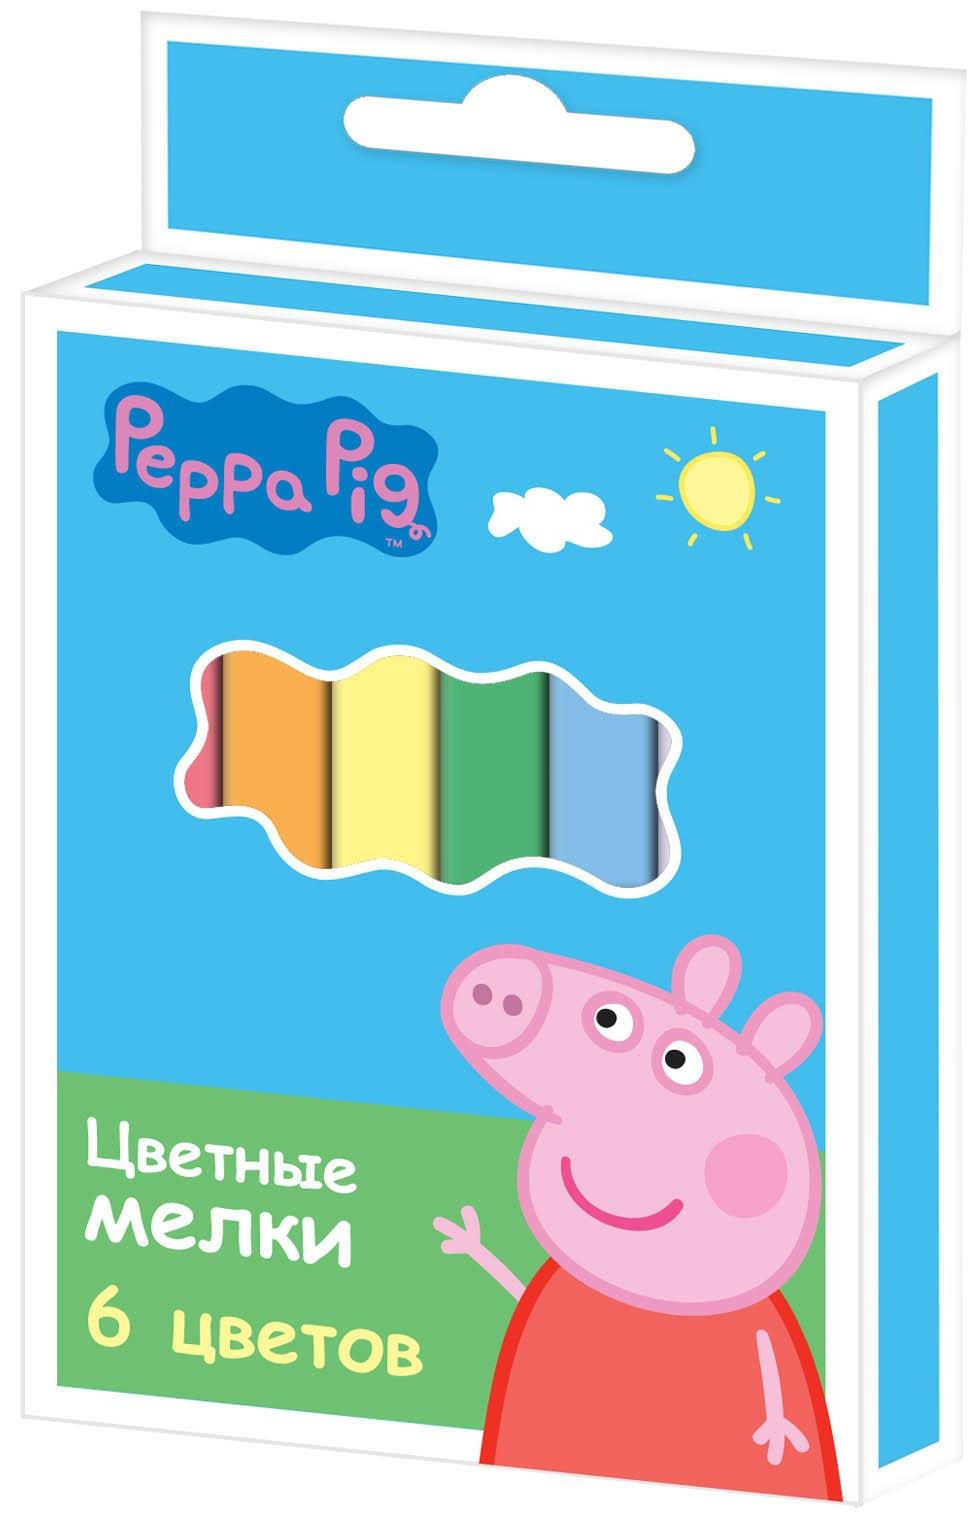 Peppa Pig Peppa Pig Набор цветных мелков Peppa Pig «Свинка Пеппа» 6 цв. peppa pig пазл для малышей хобби 6 в 1